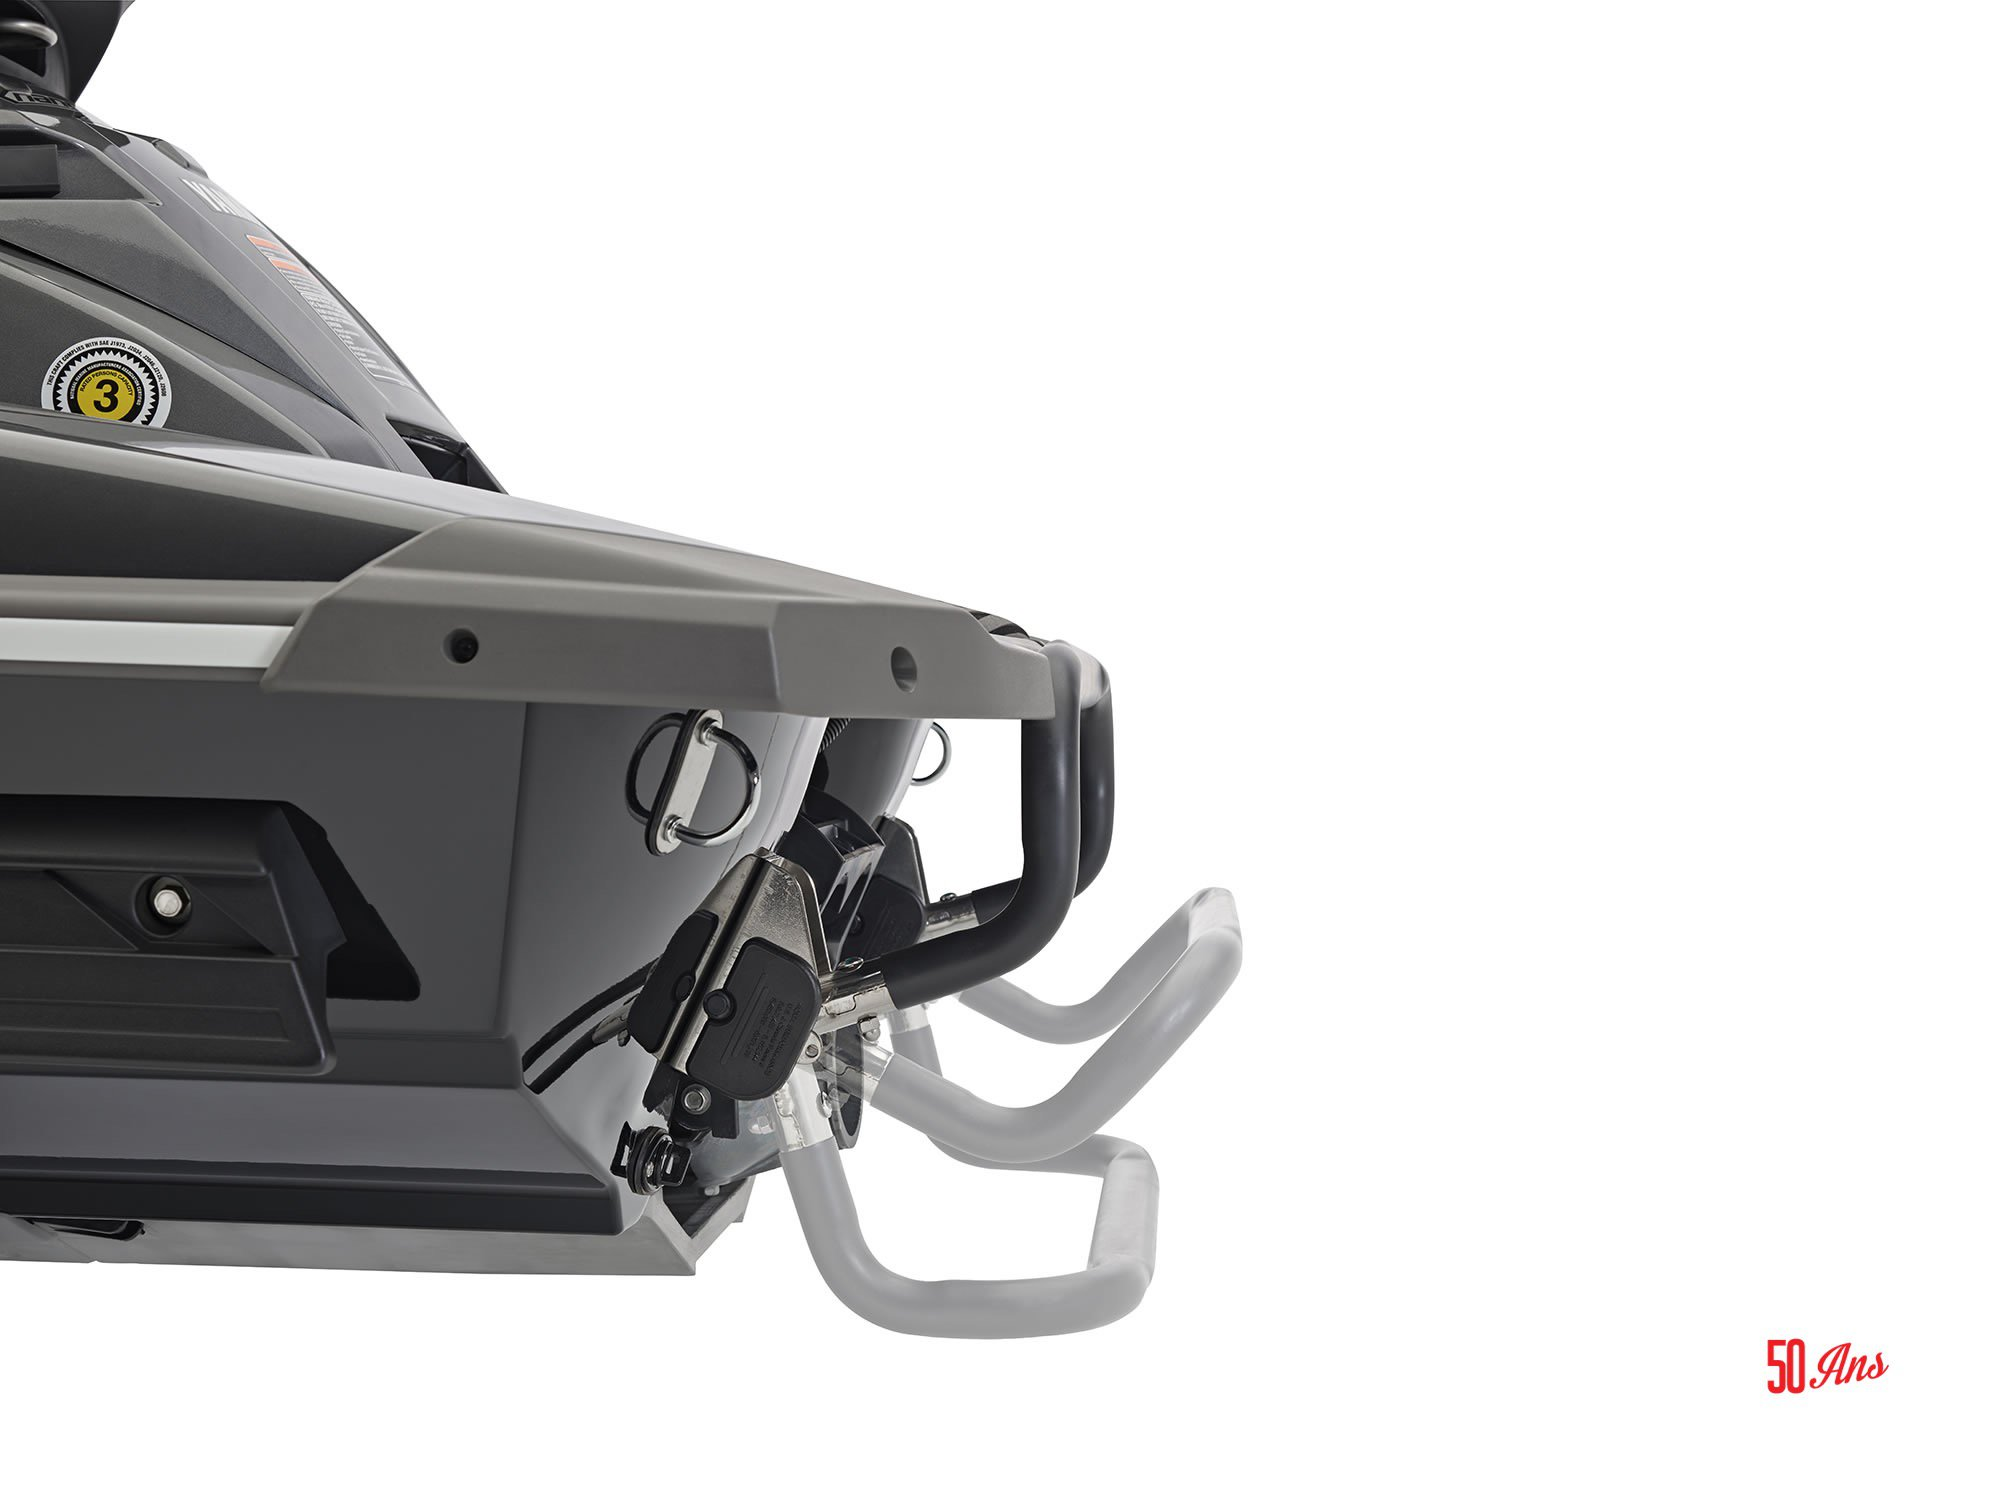 Yamaha FX Cruiser HO - 2018-FX-Cruiser-HO-Gray-Reboarding-Step-1_l